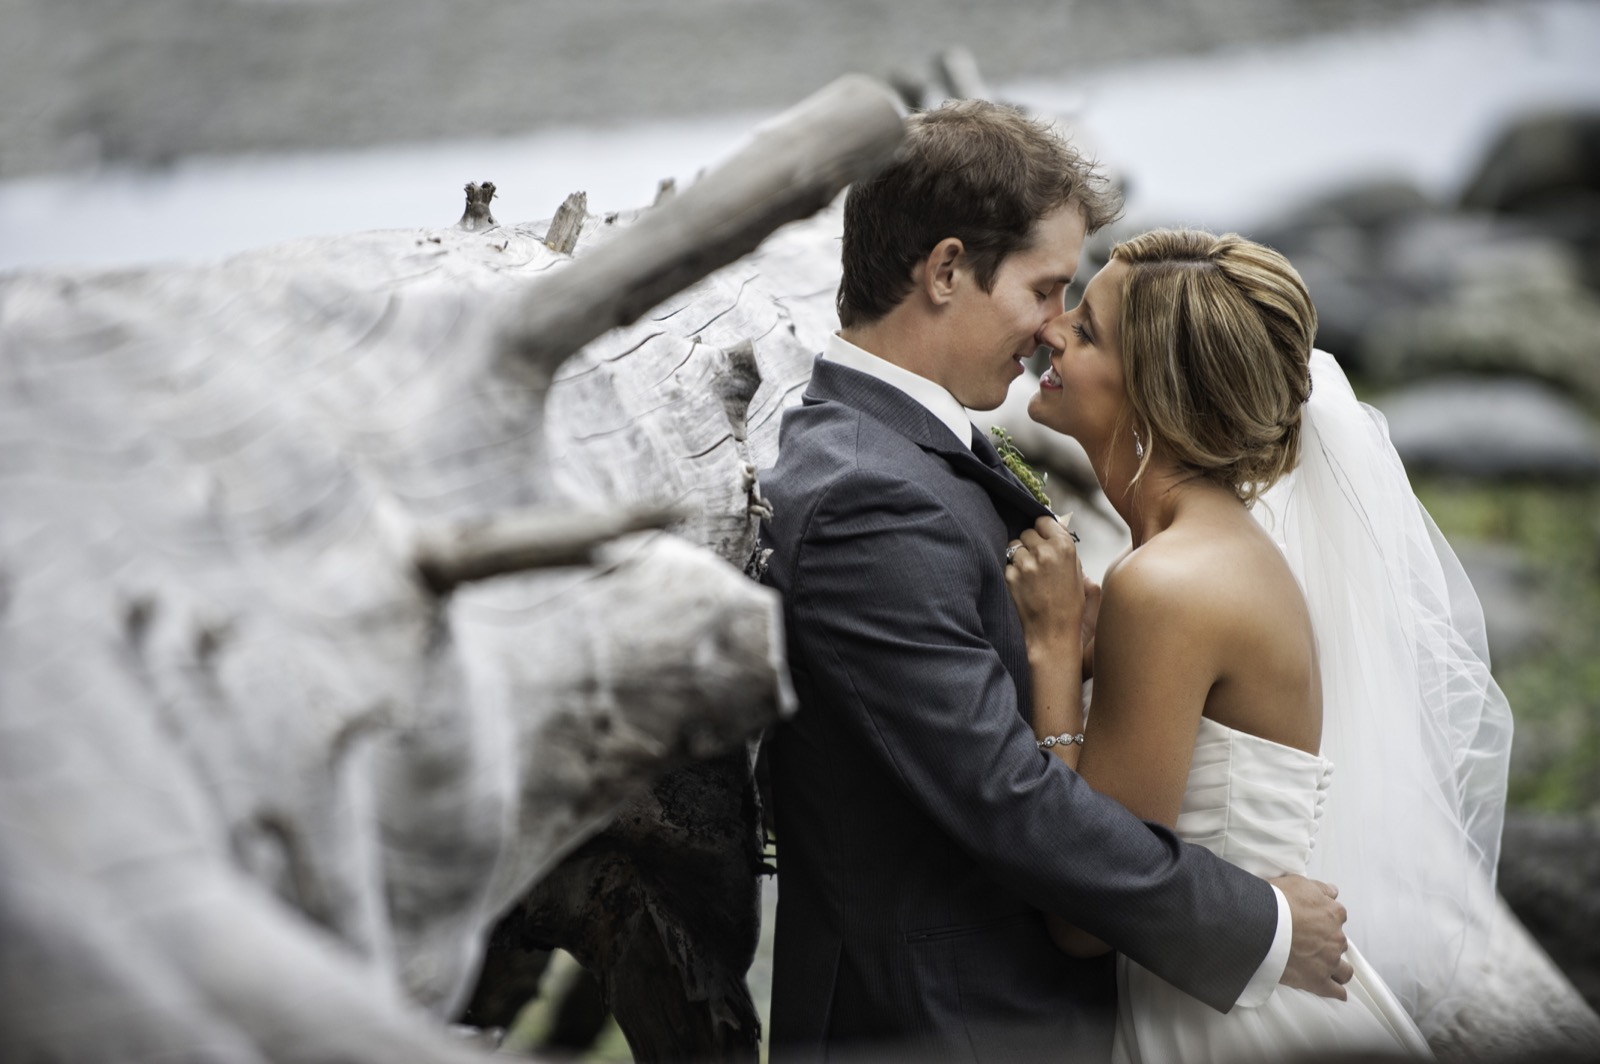 sooke-wedding-photographers-craidelonna-oceanedge-lodge-wedding-74.jpg